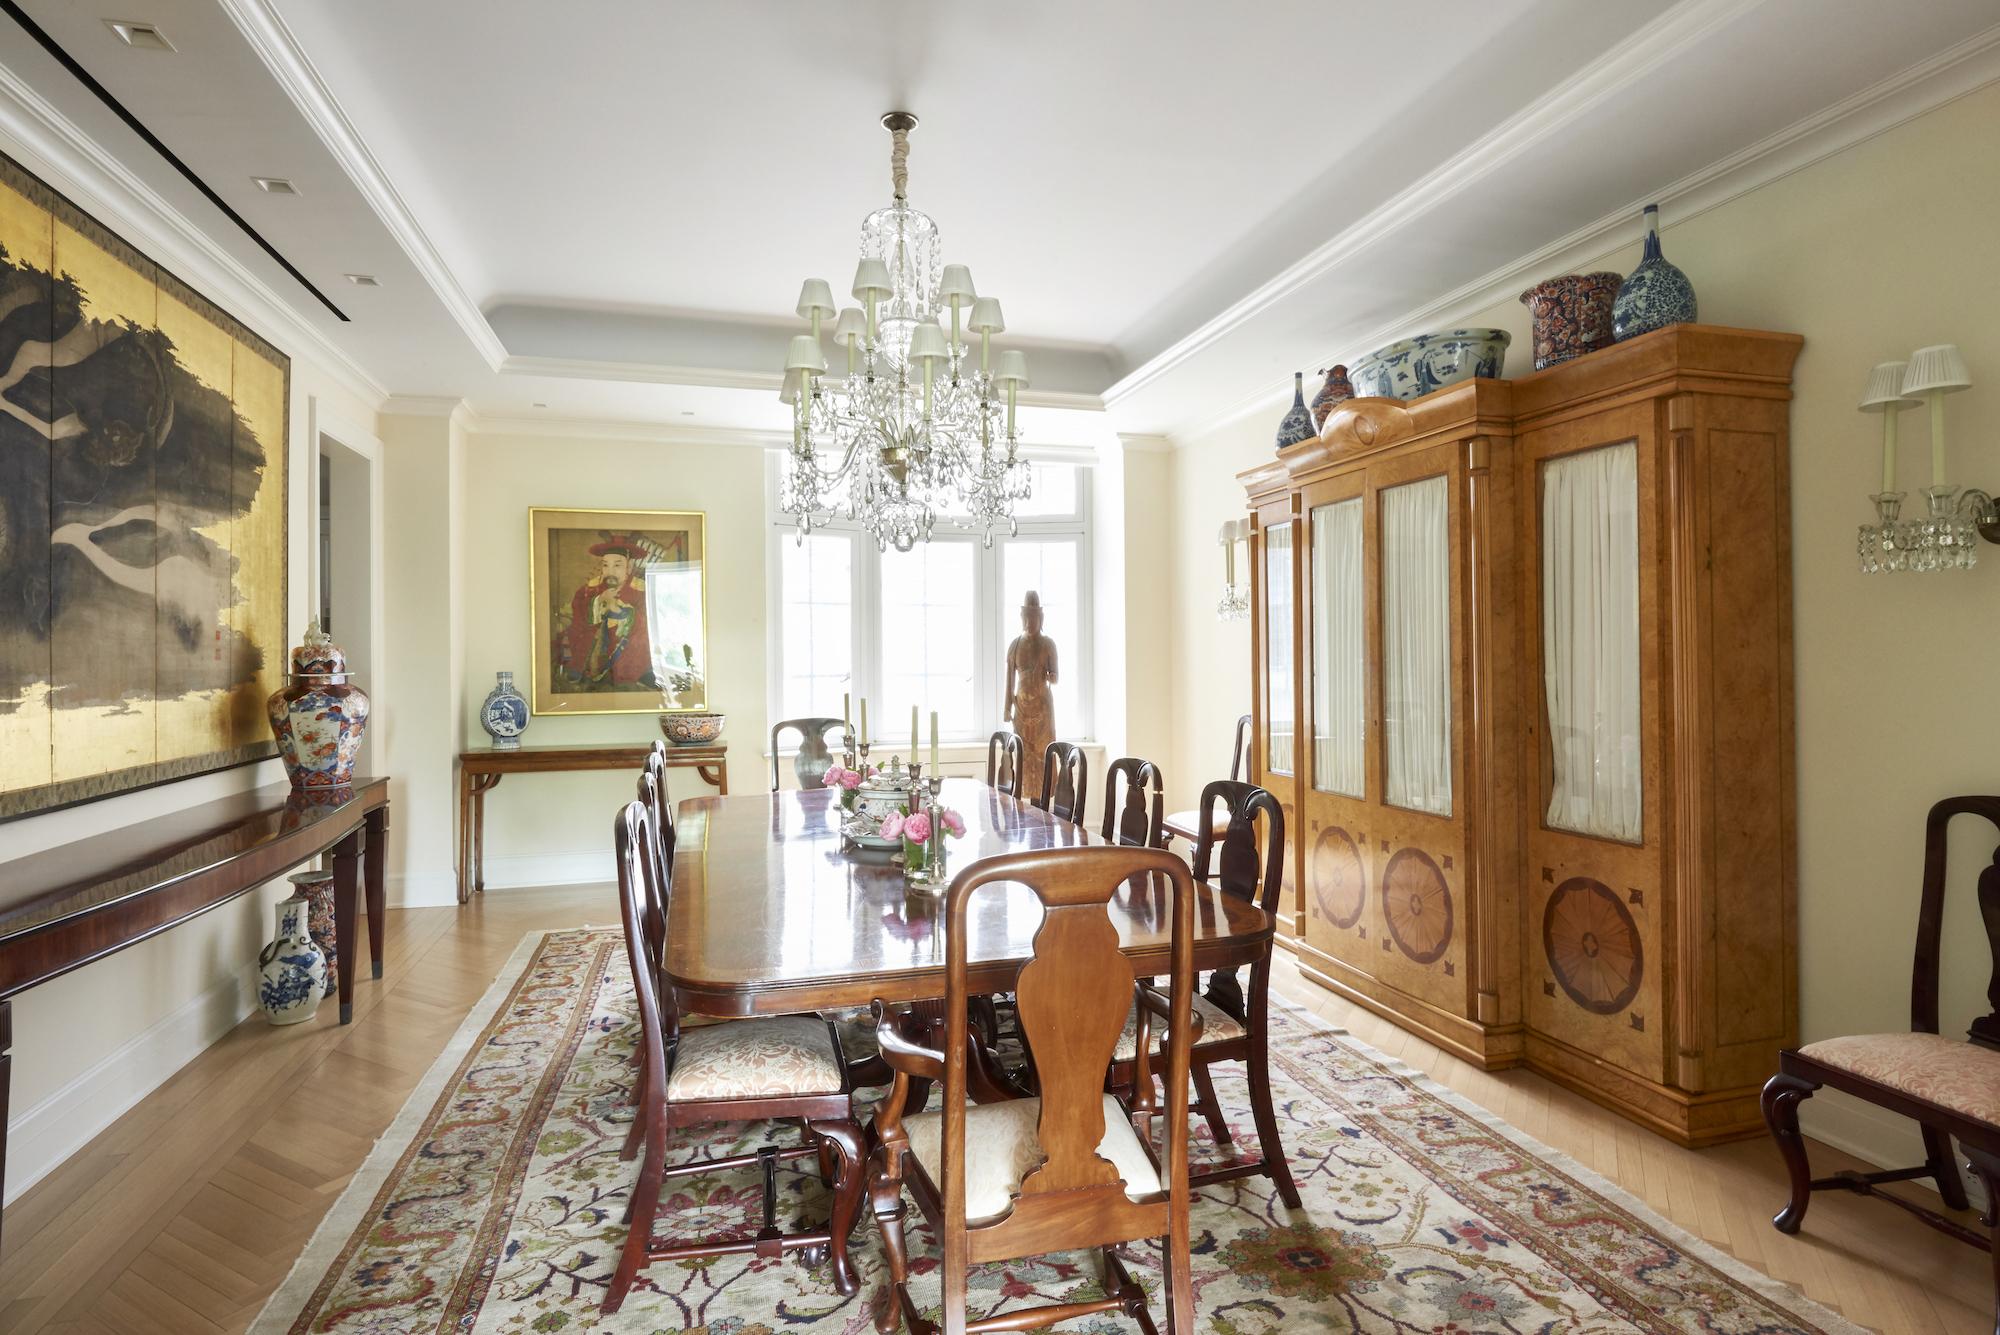 Lexus Of Dublin >> Daily Dream Home: 2 East 88th Street - Pursuitist